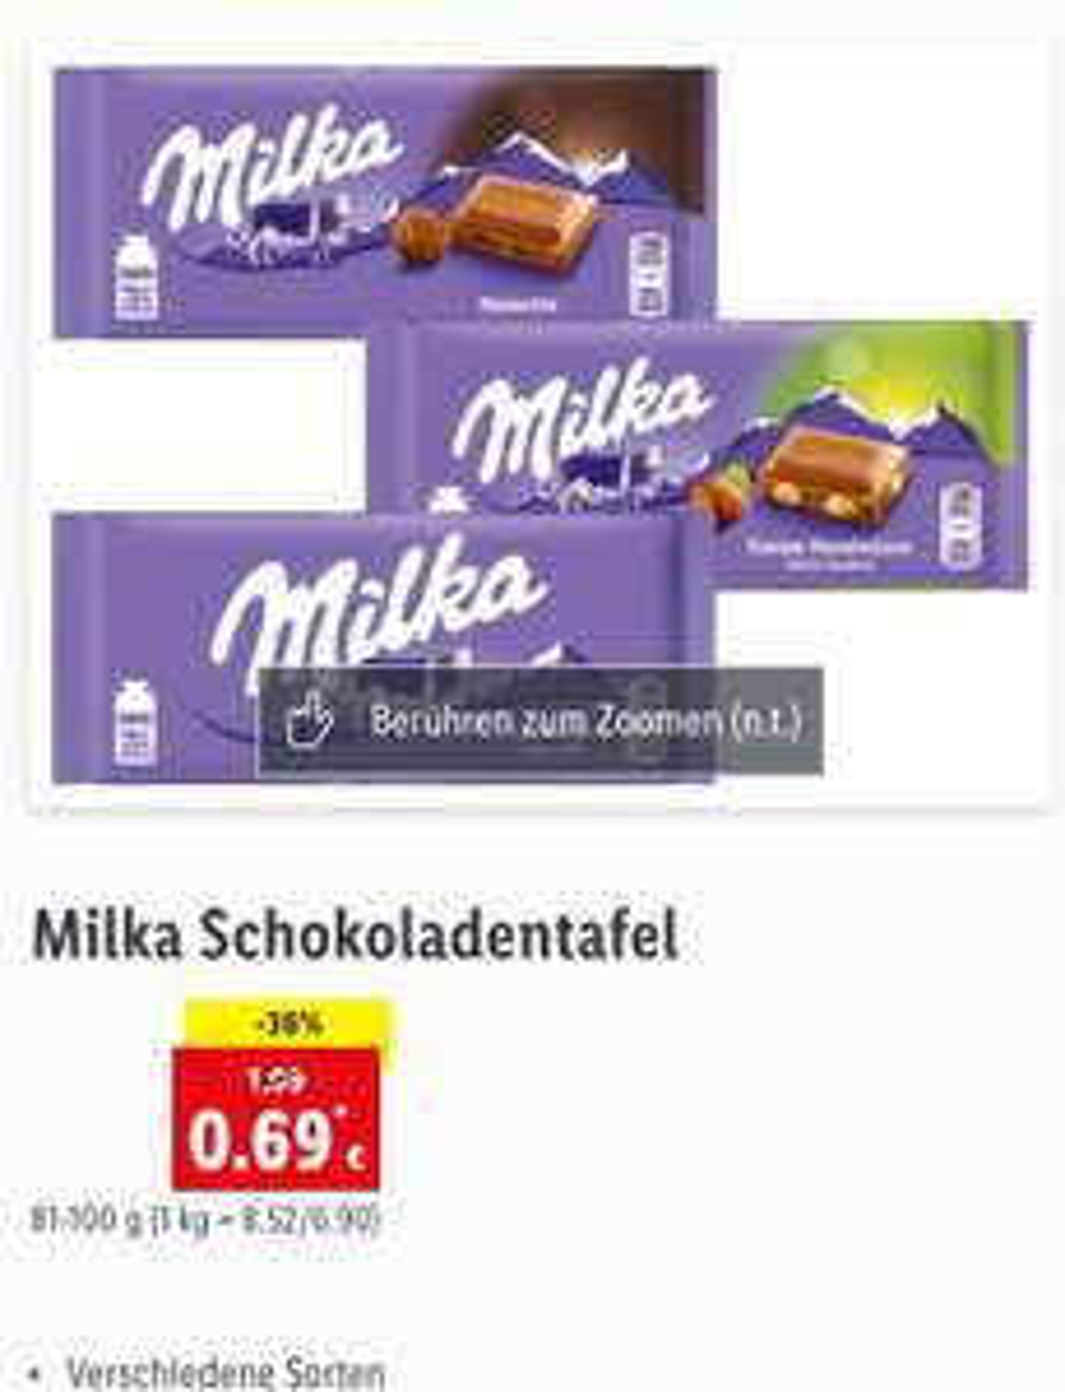 Milka Tafelschokolade (81-100g) in Aktion bei Lidl